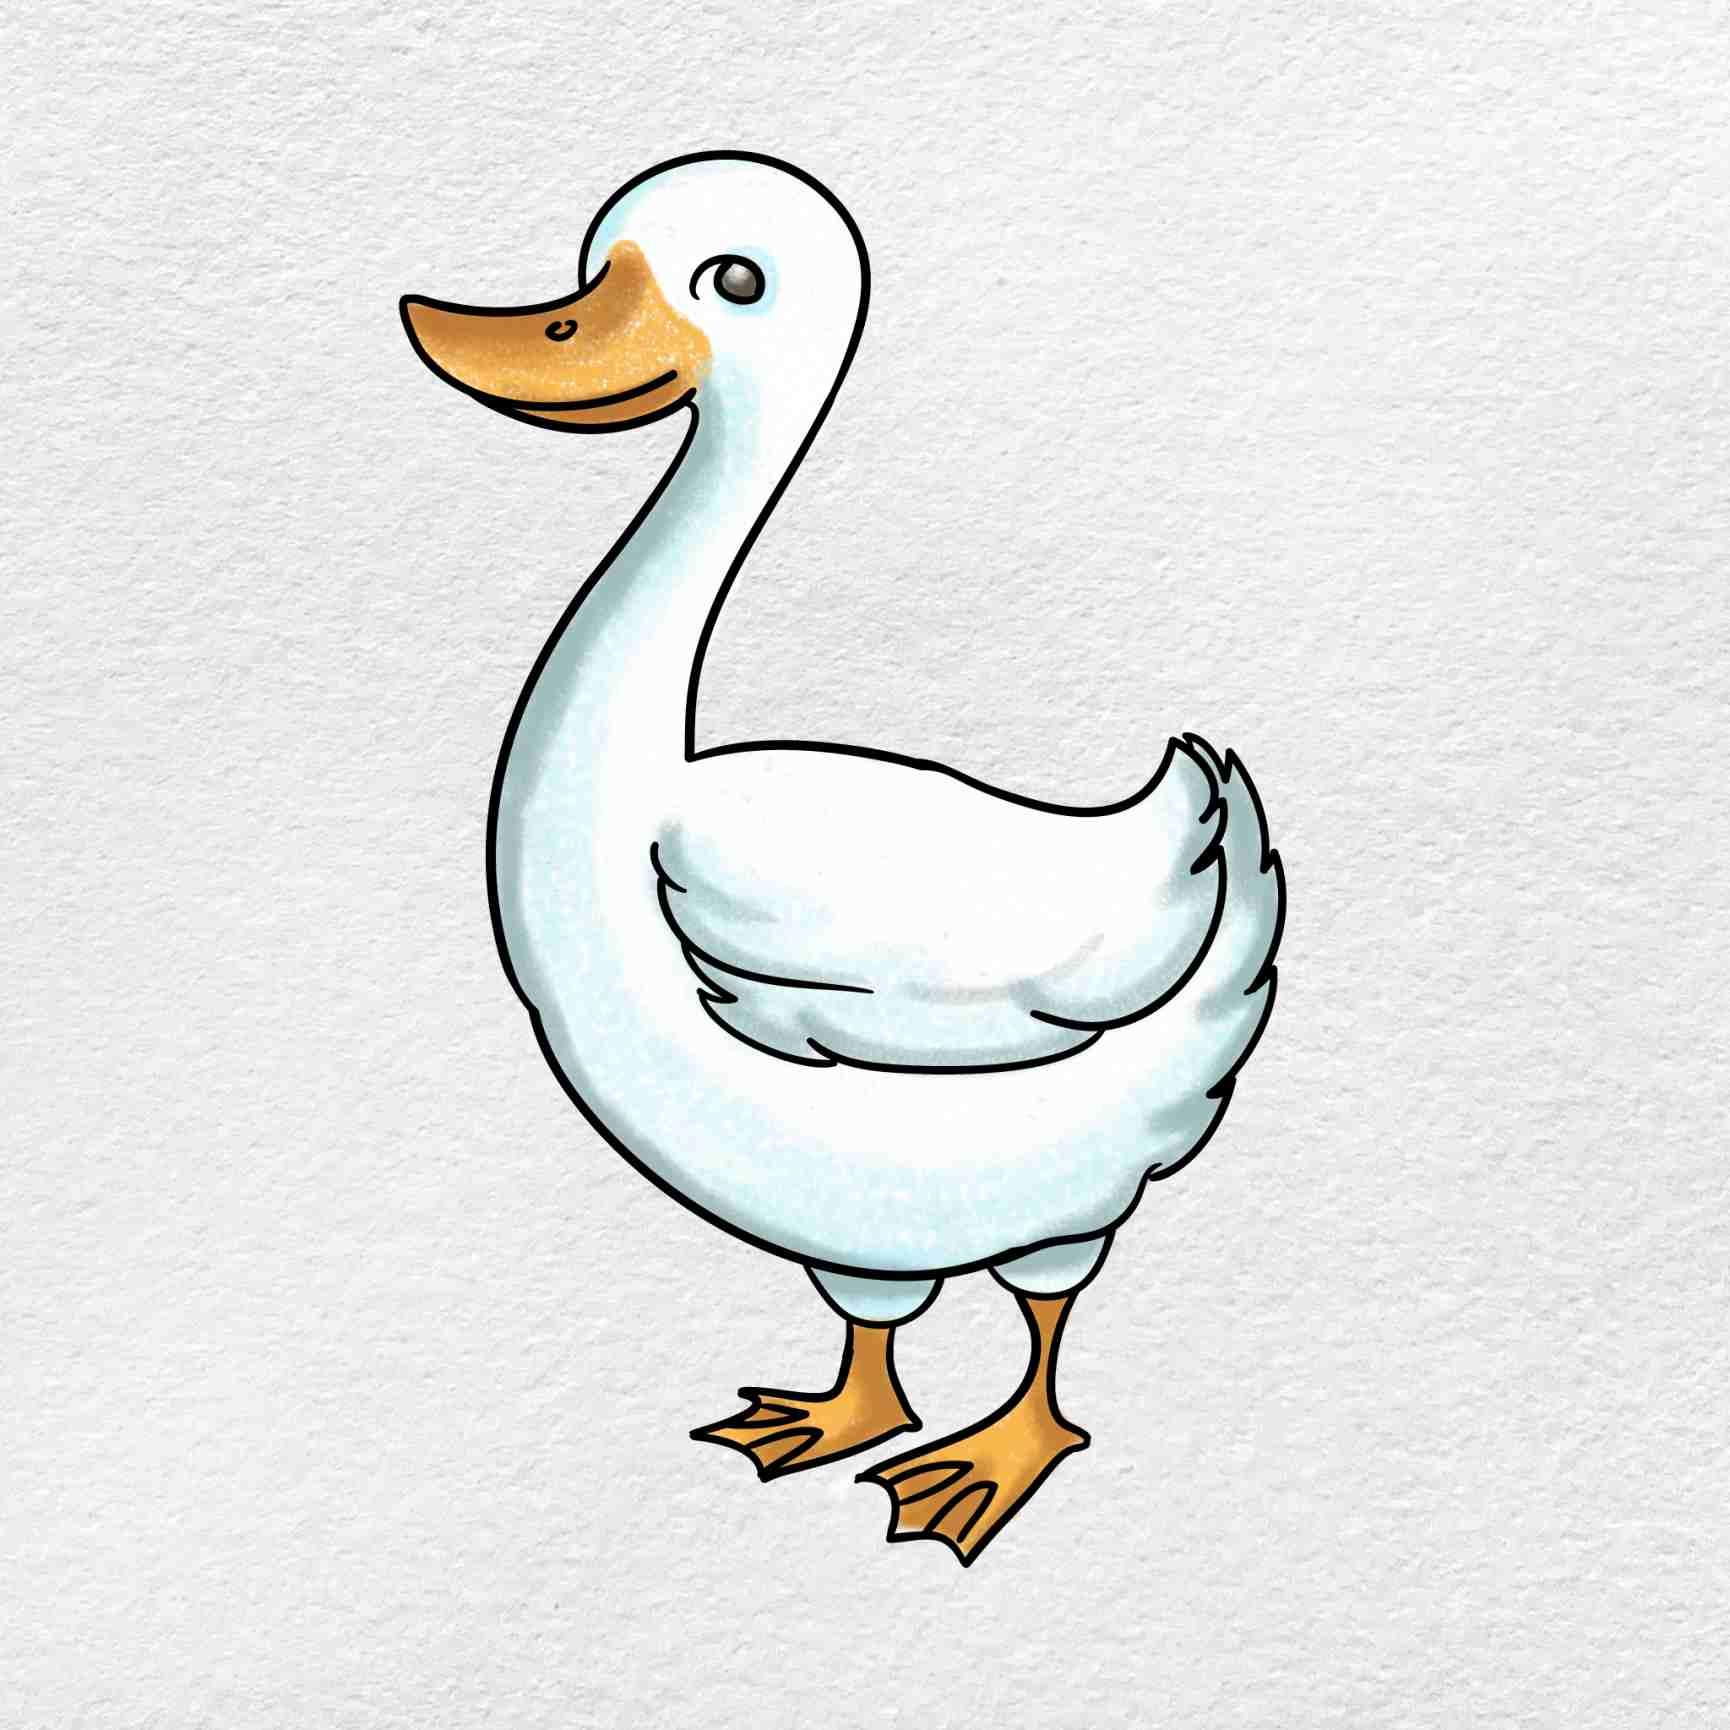 Goose Drawing: Step 9